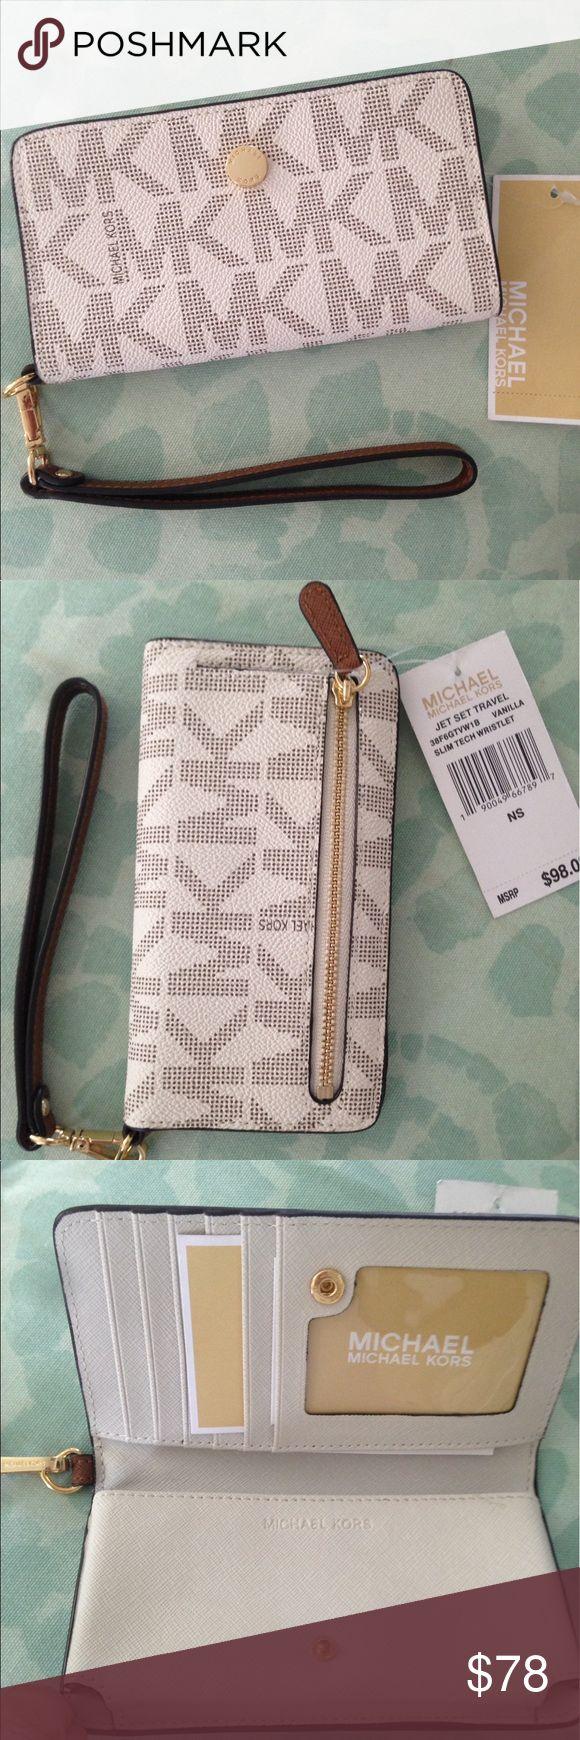 Women wristlet Jet set travel slim tech wristlet (vanilla color) Michael Kors Bags Clutches & Wristlets